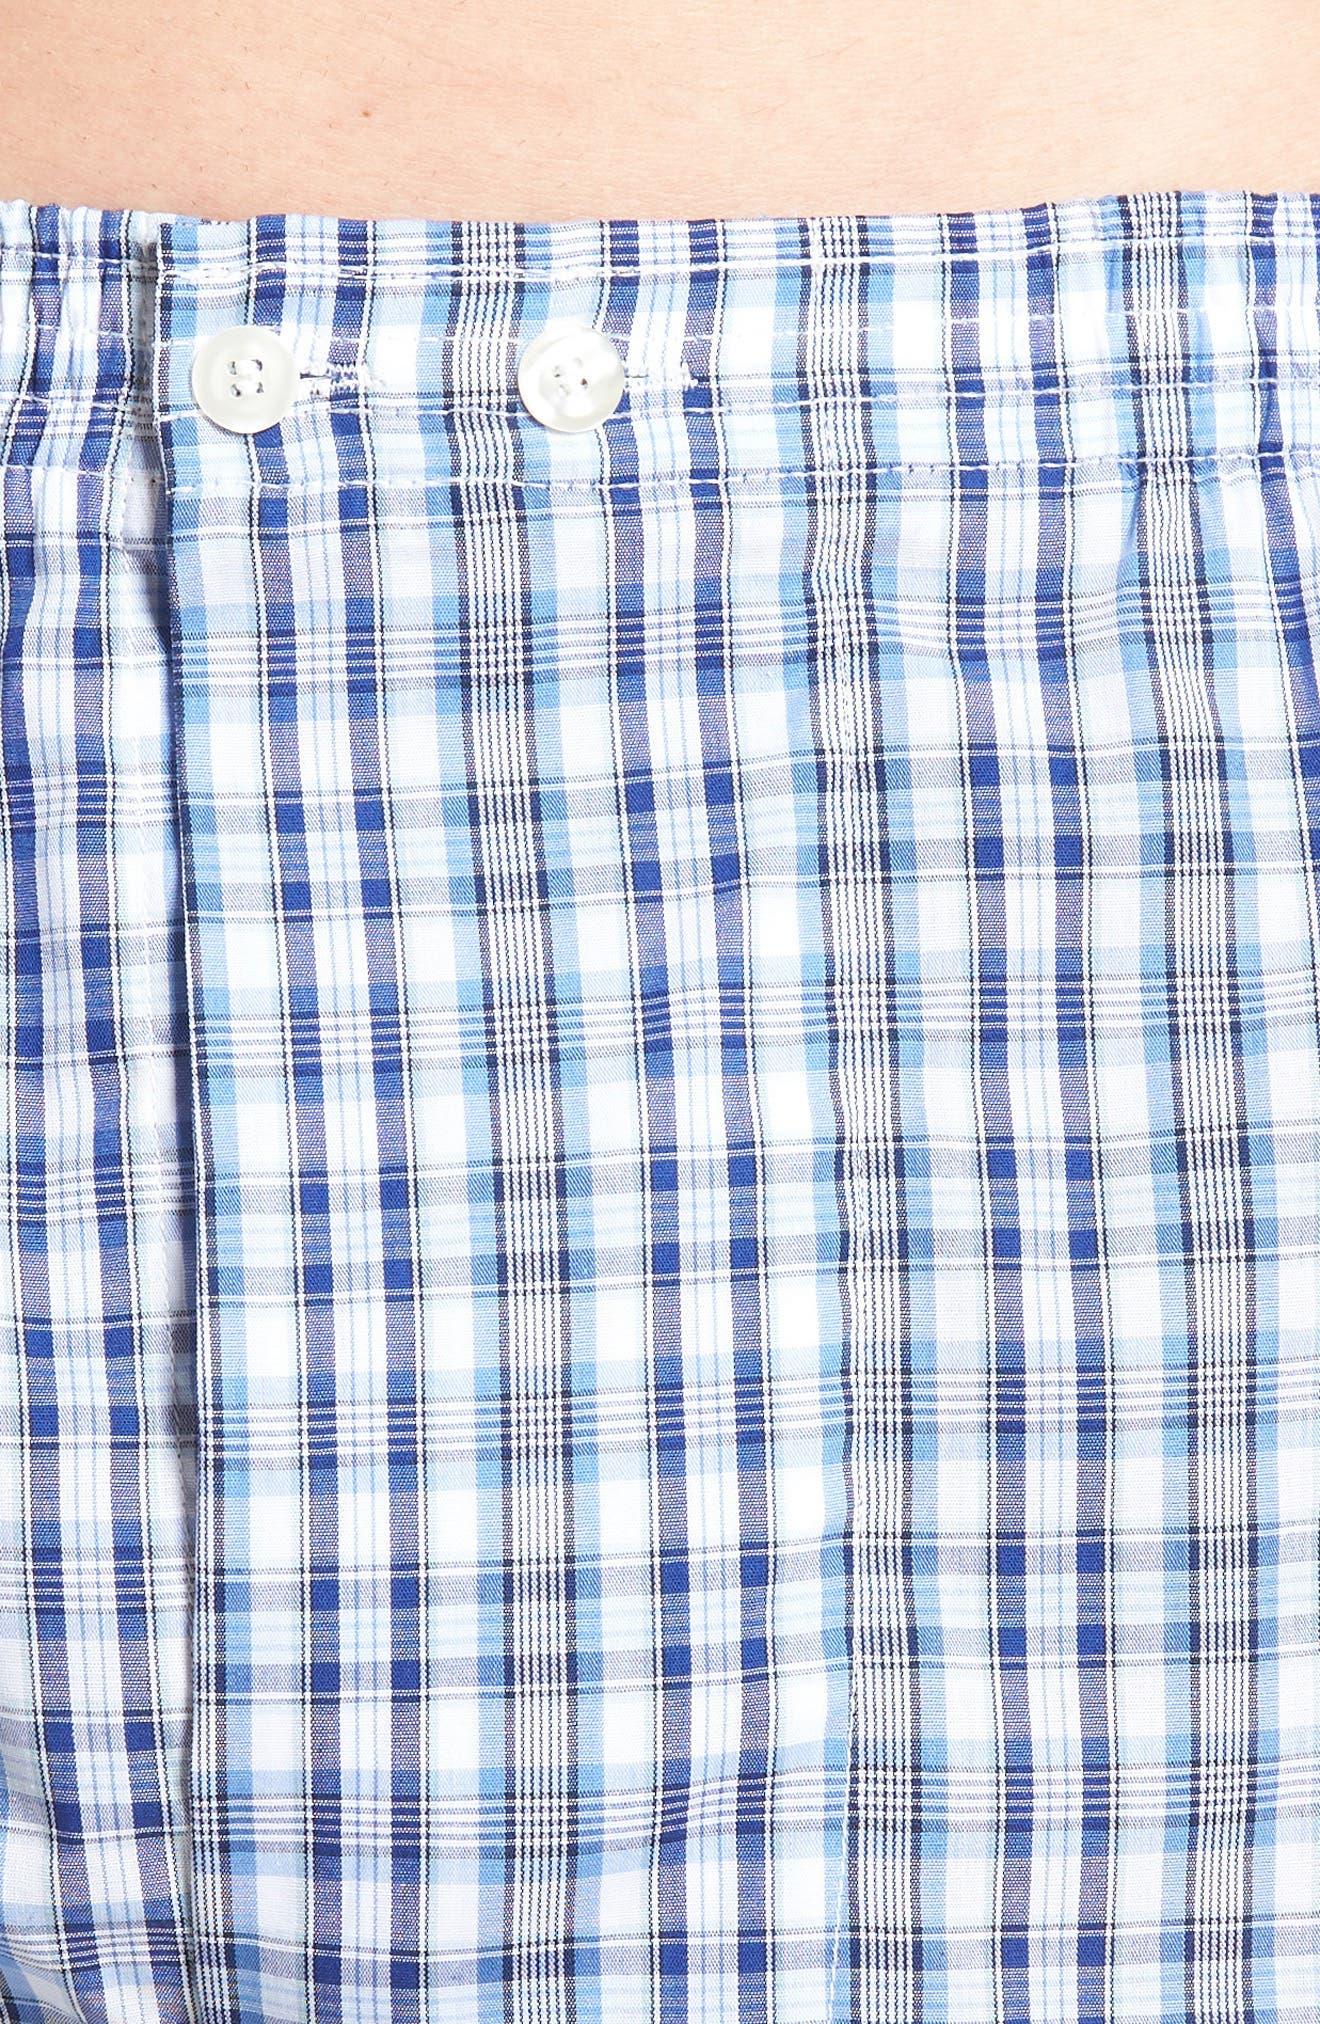 3-Pack Classic Fit Boxers,                             Alternate thumbnail 5, color,                             BLUE DAZZLE SOLID- PLAID PACK